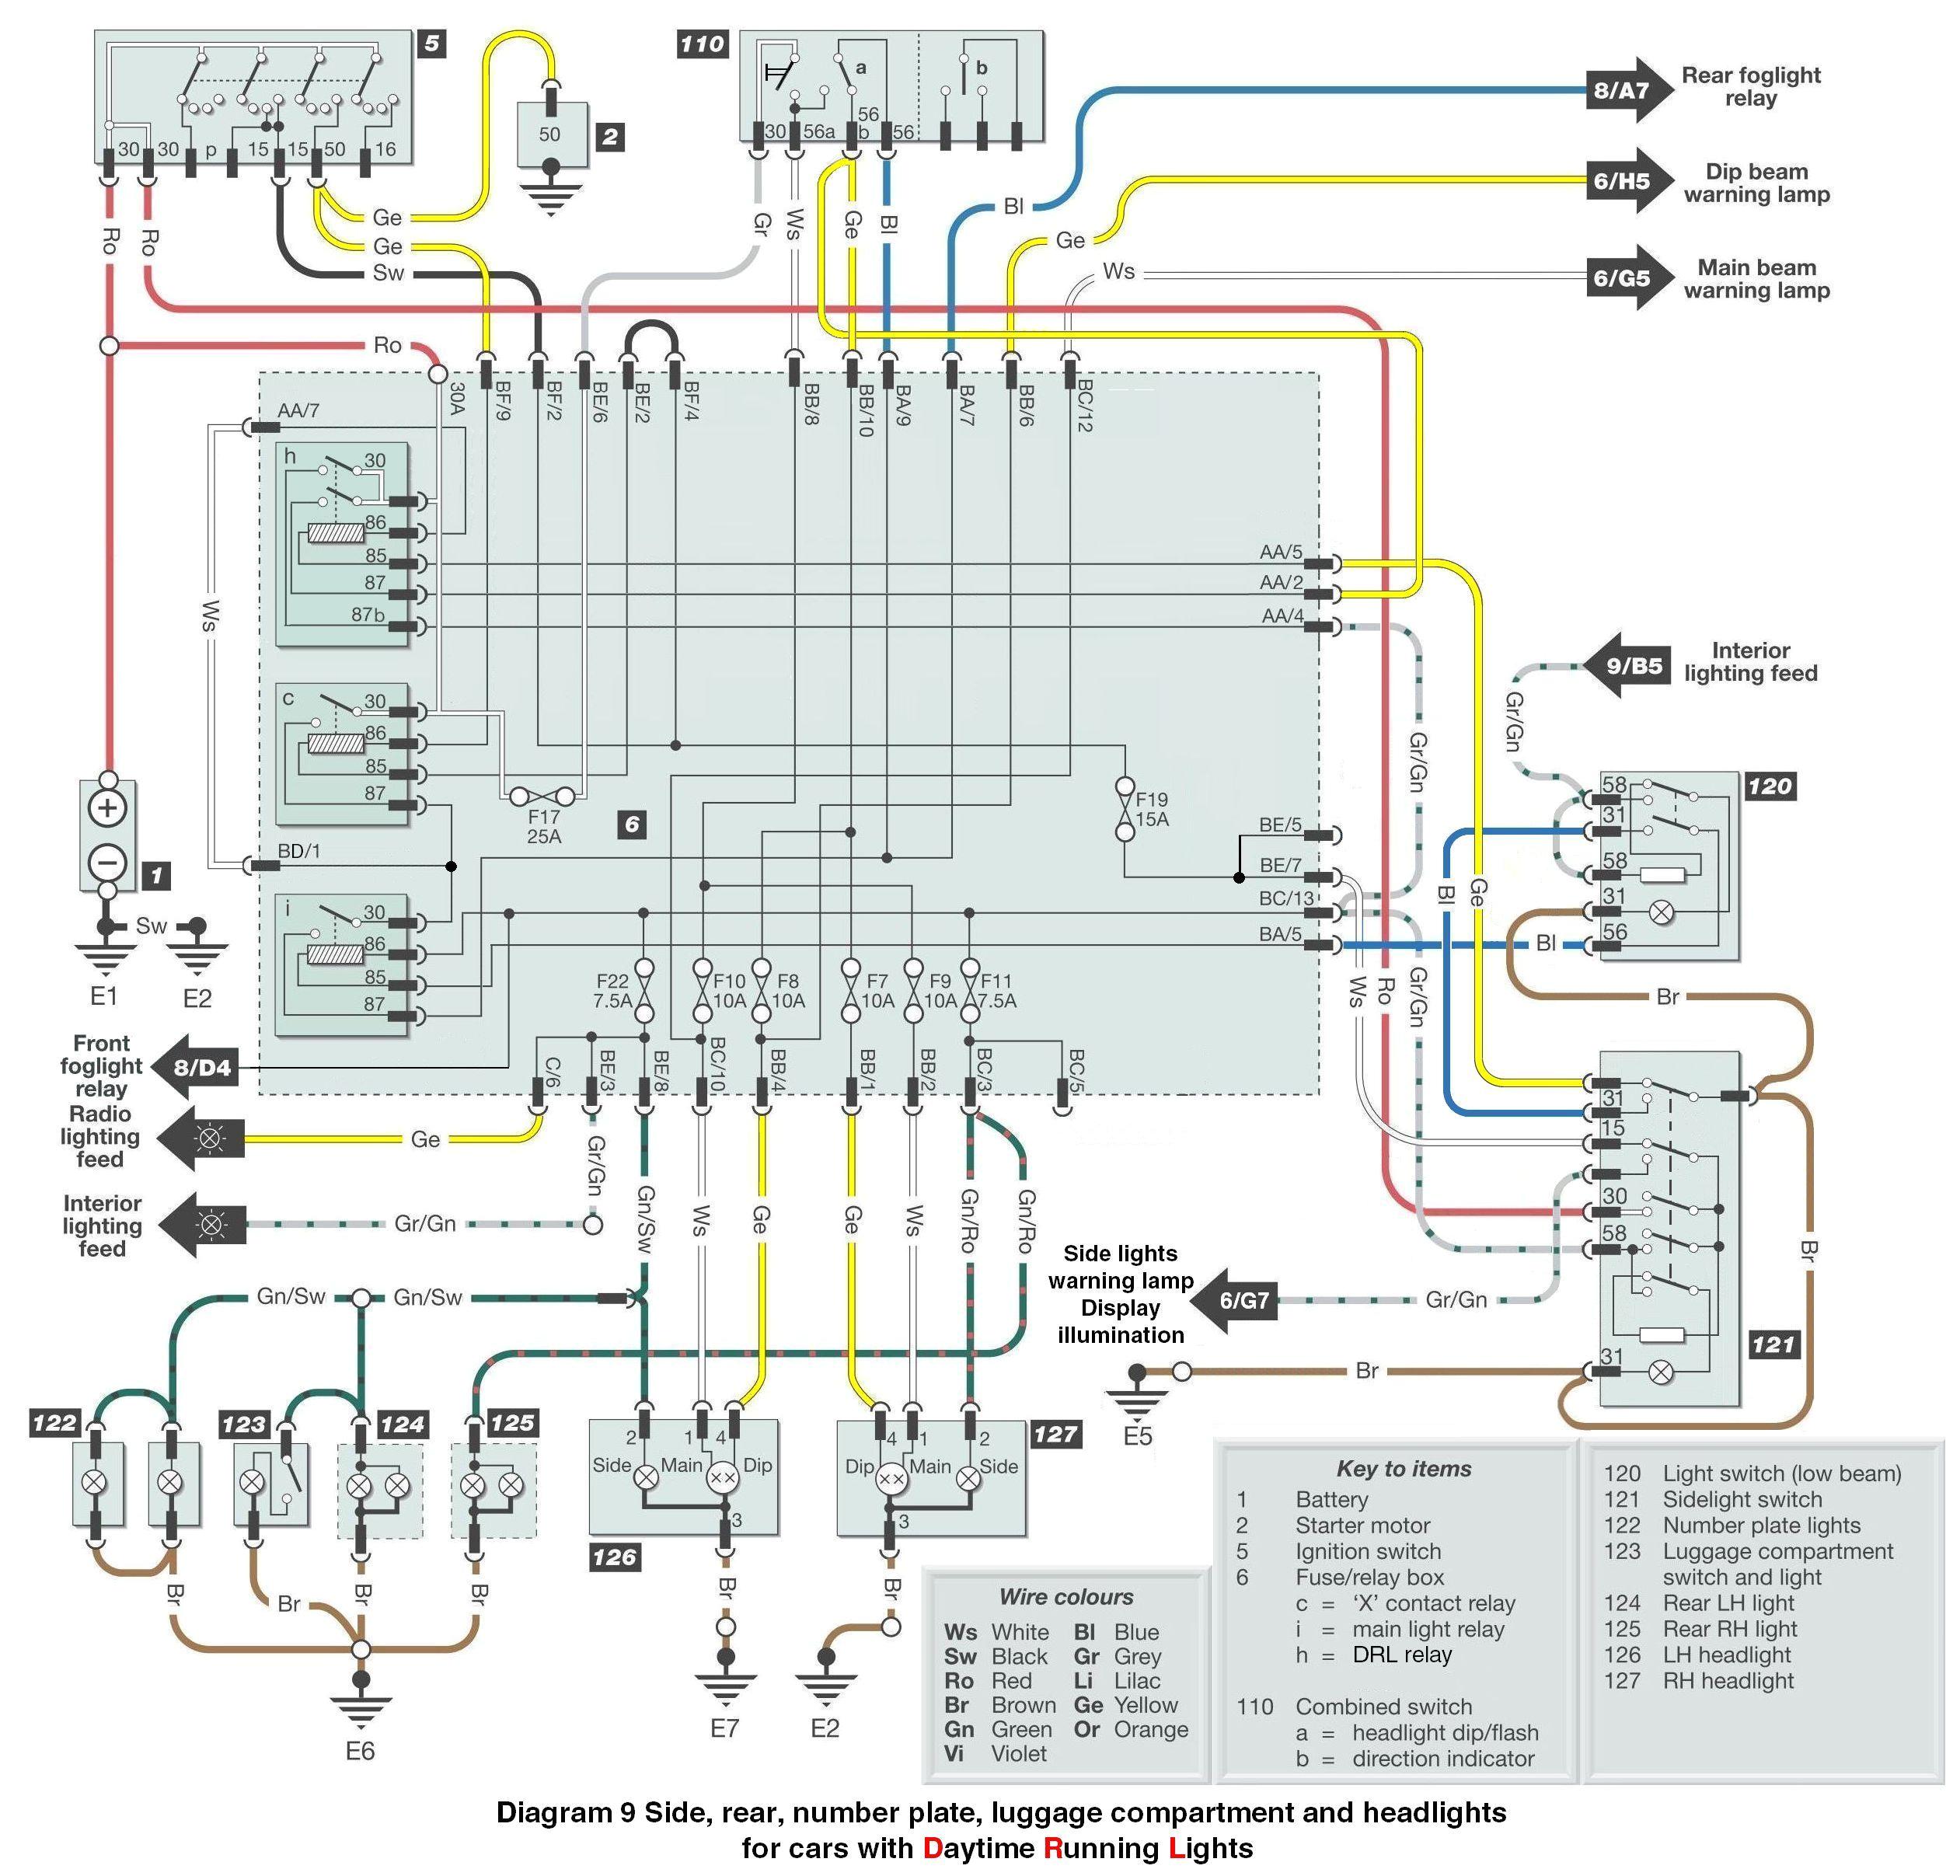 skoda ac wiring diagram wiring diagram name skoda kes diagram